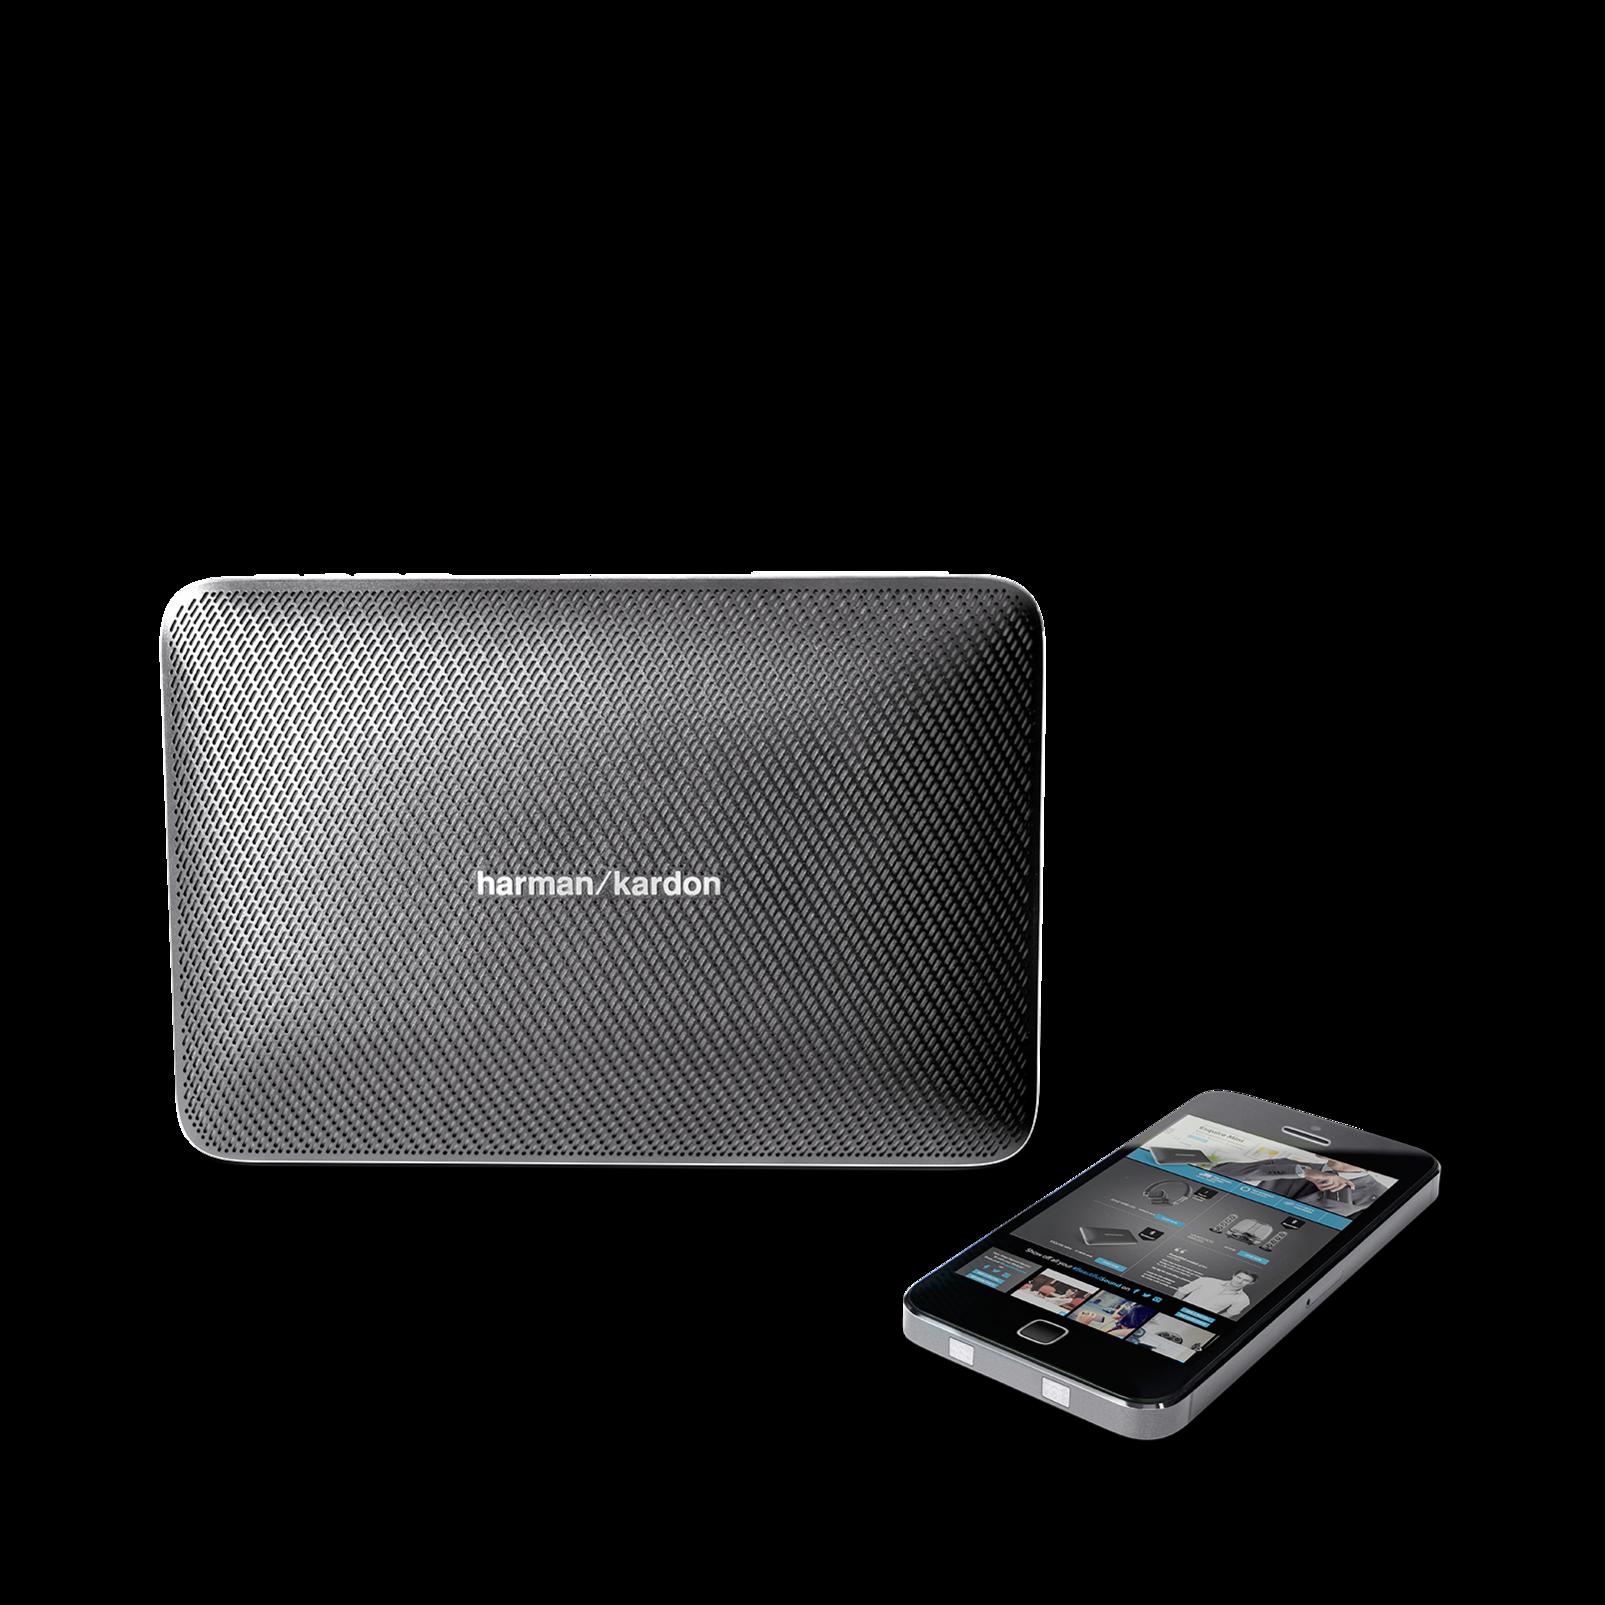 Esquire 2 - Grey - Premium portable Bluetooth speaker with quad microphone conferencing system - Detailshot 5